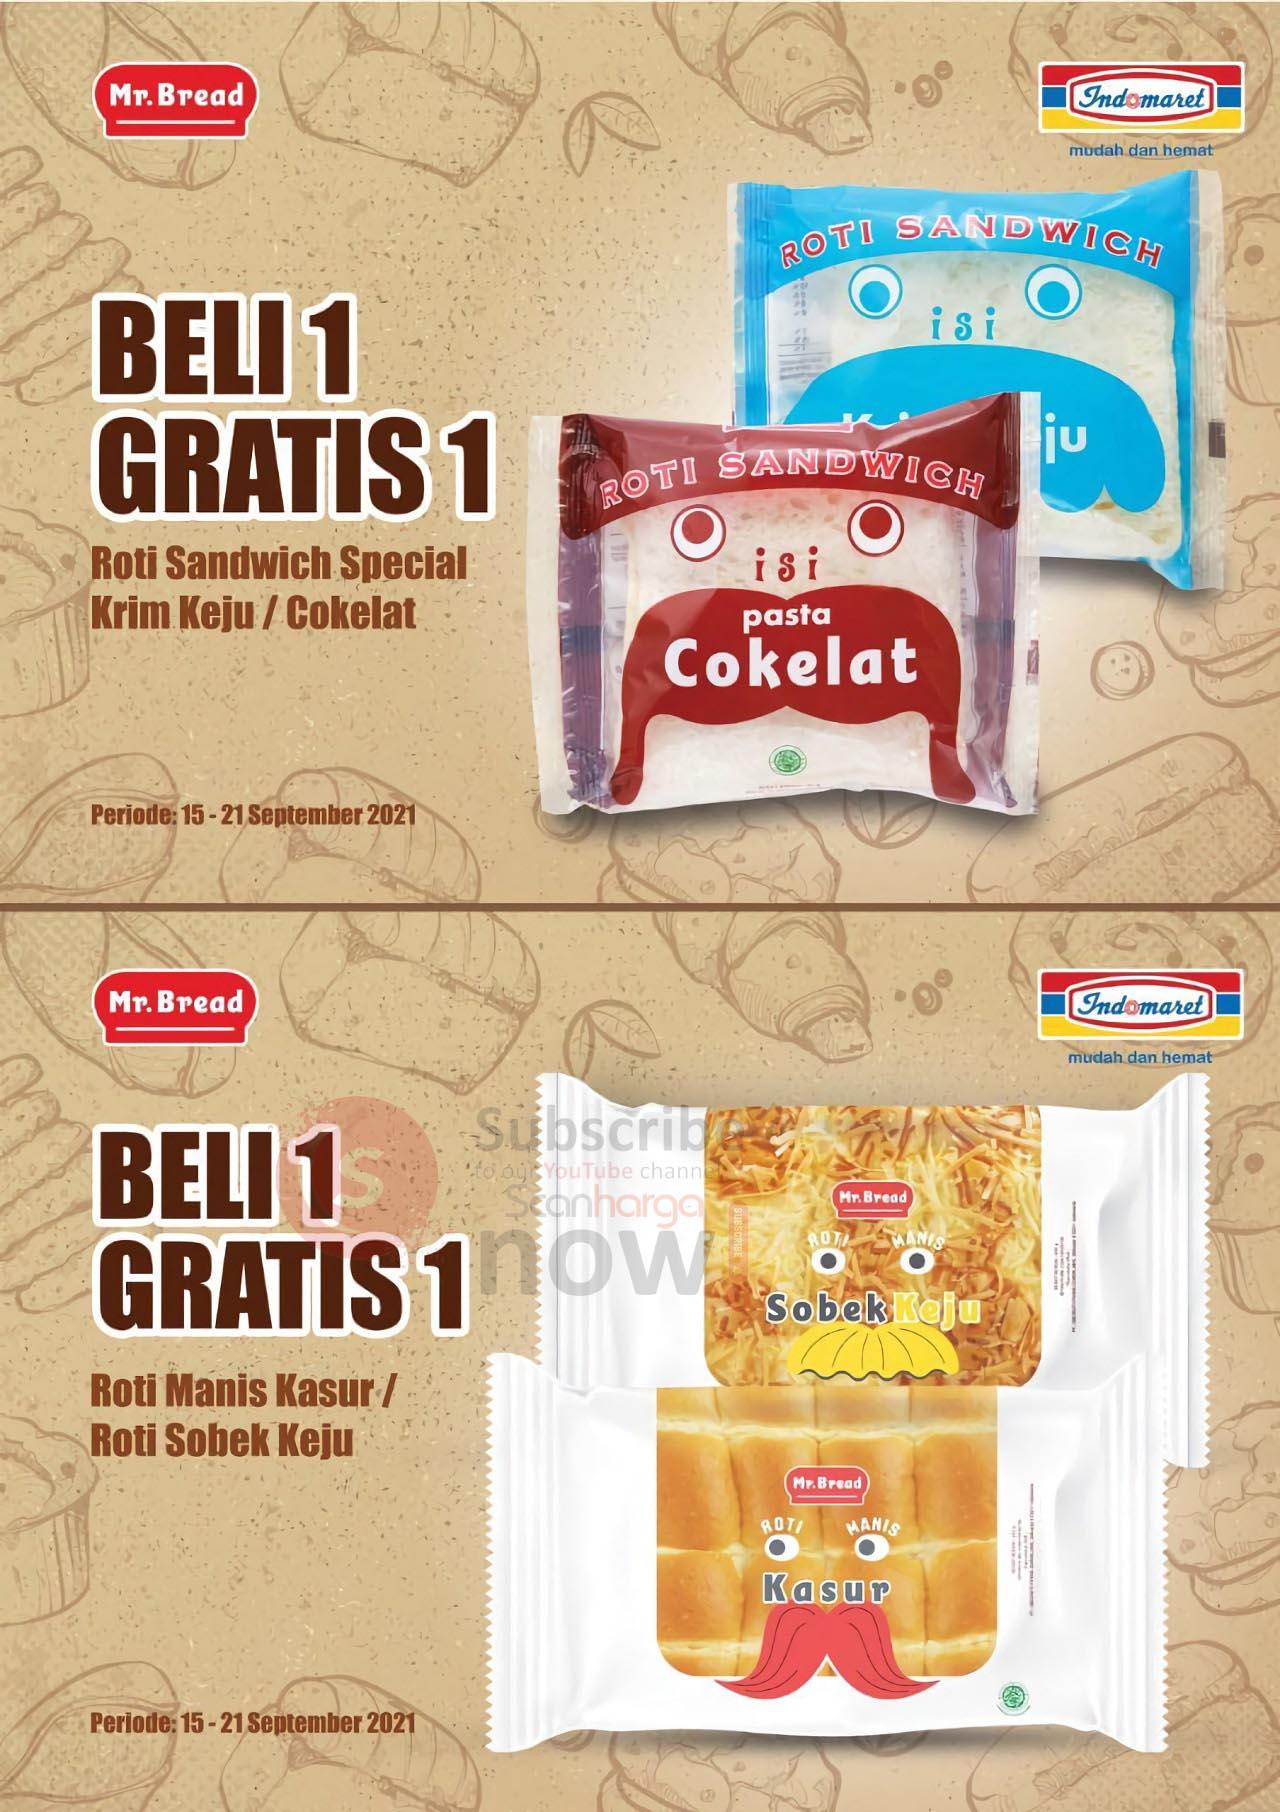 Promo Mr Bread Roti Indomaret Beli 1 Gratis 1 Periode 15 - 21 September 2021 2